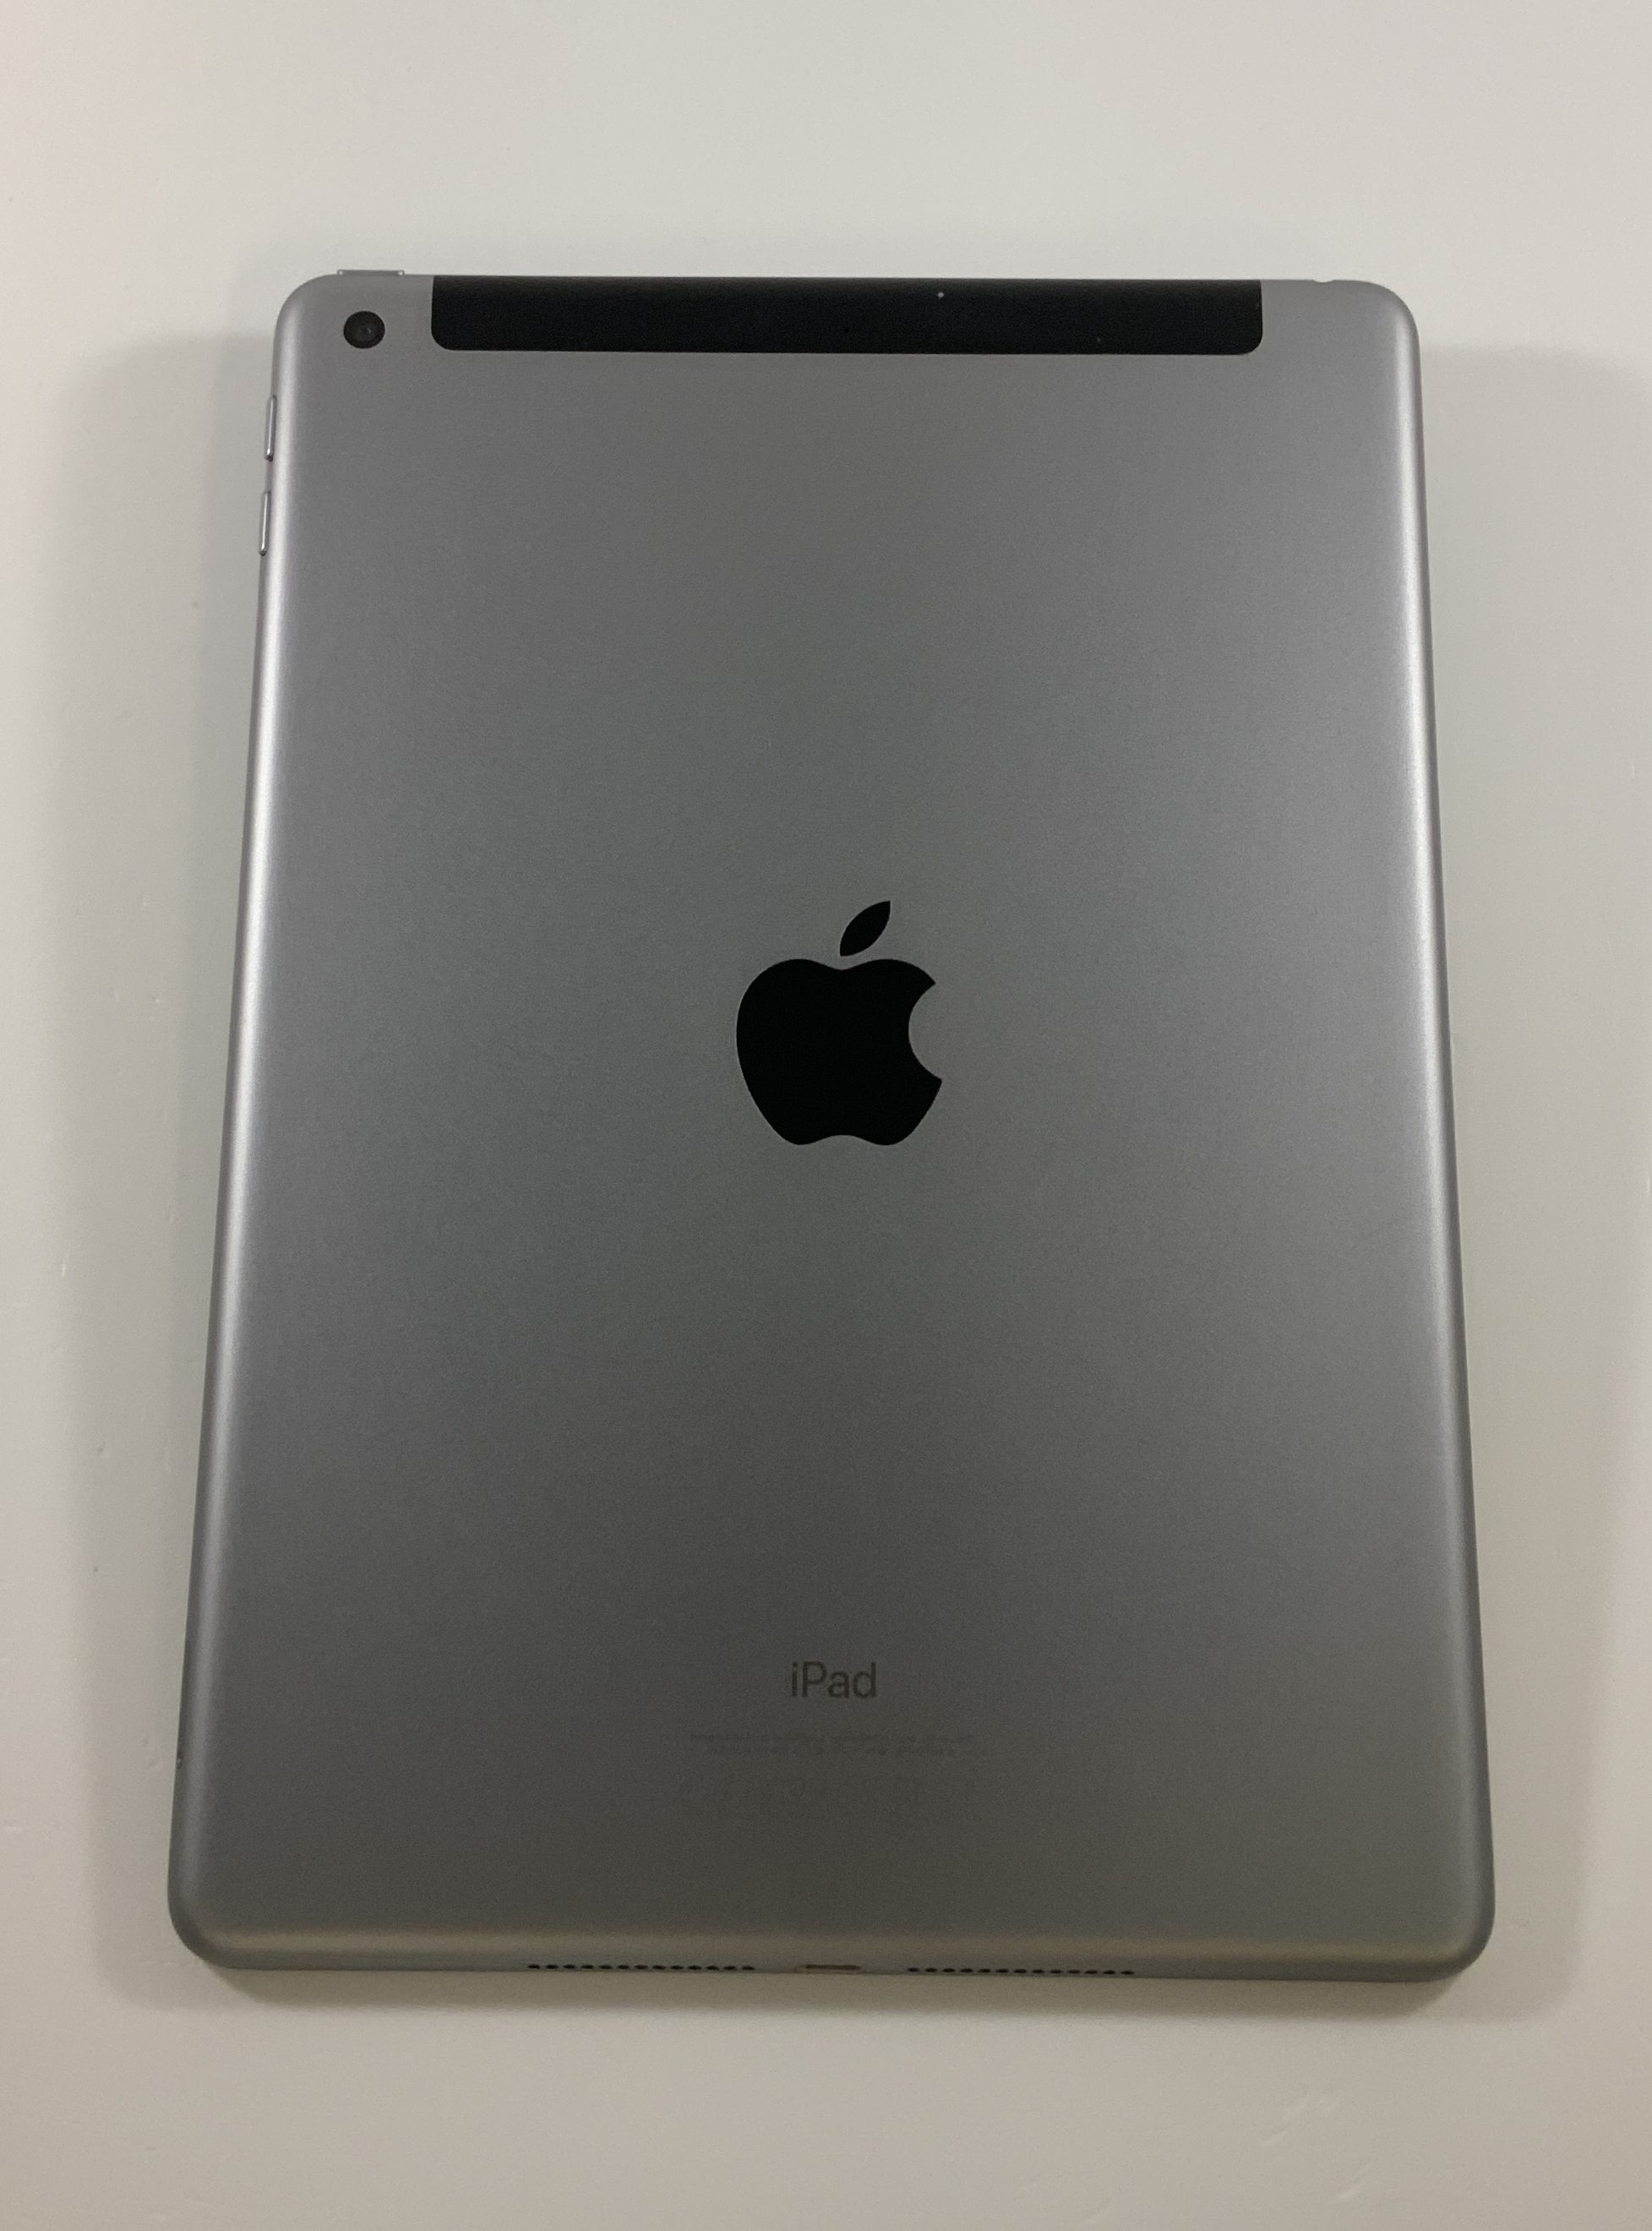 iPad 5 Wi-Fi + Cellular 128GB, 128GB, Space Gray, bild 2